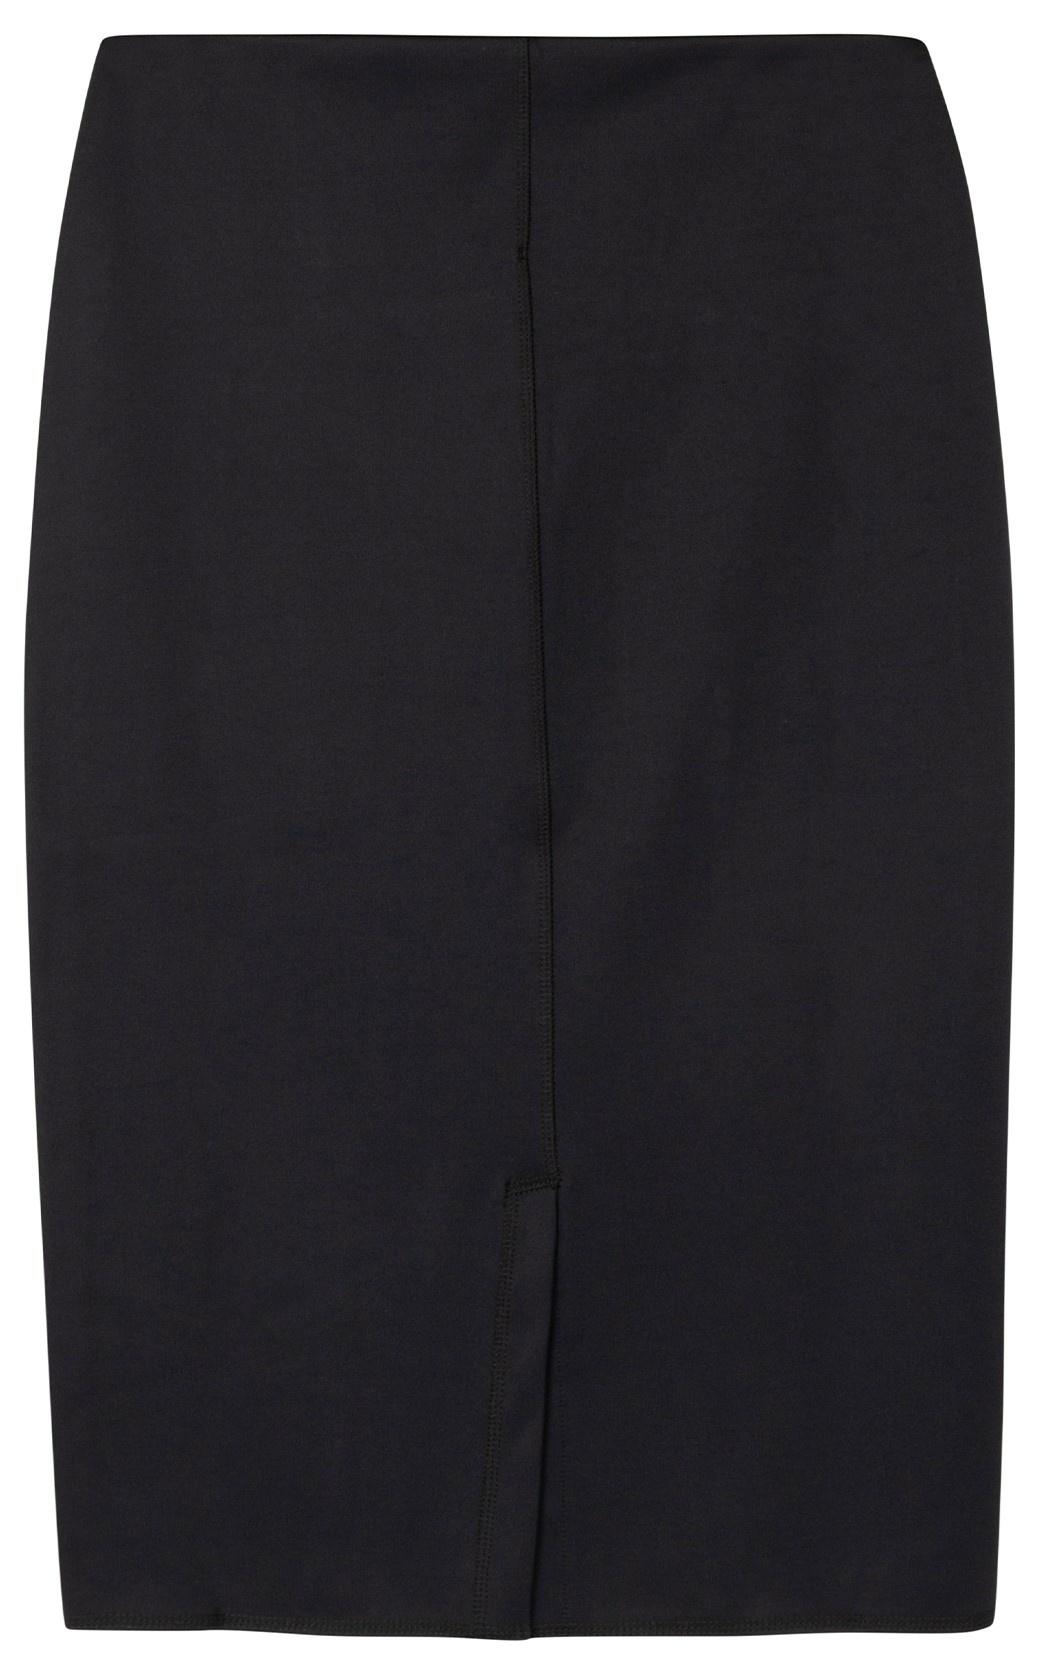 Rok scuba pencil skirt black-3